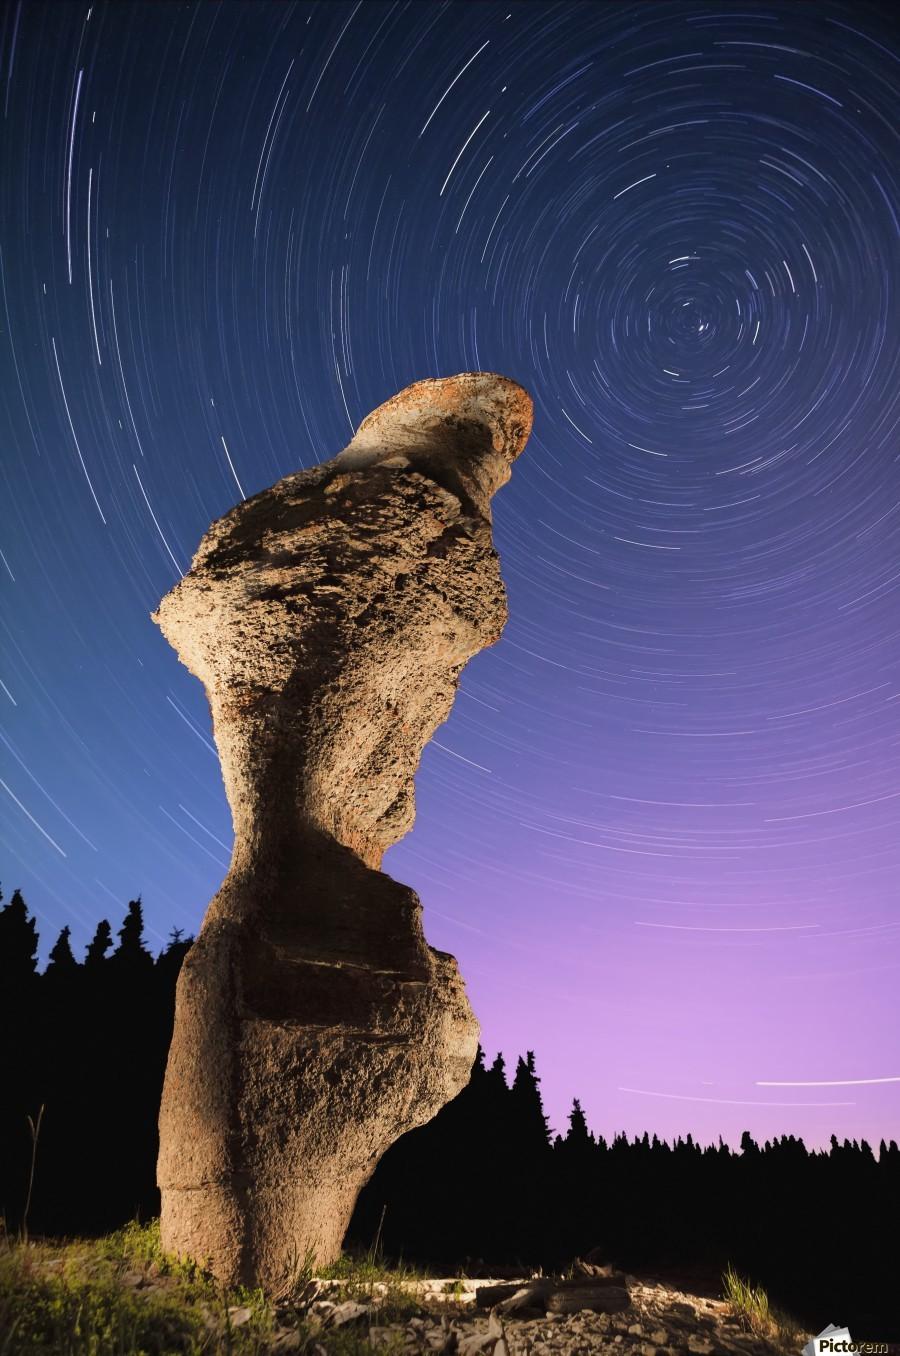 Light painting on monolith and star trails, Anse des Bonnes Femmes at Ile Niapiskau, Mingan Archipelago National Park Reserve of Canada, Cote-Nord, Duplessis region; Quebec, Canada  Print